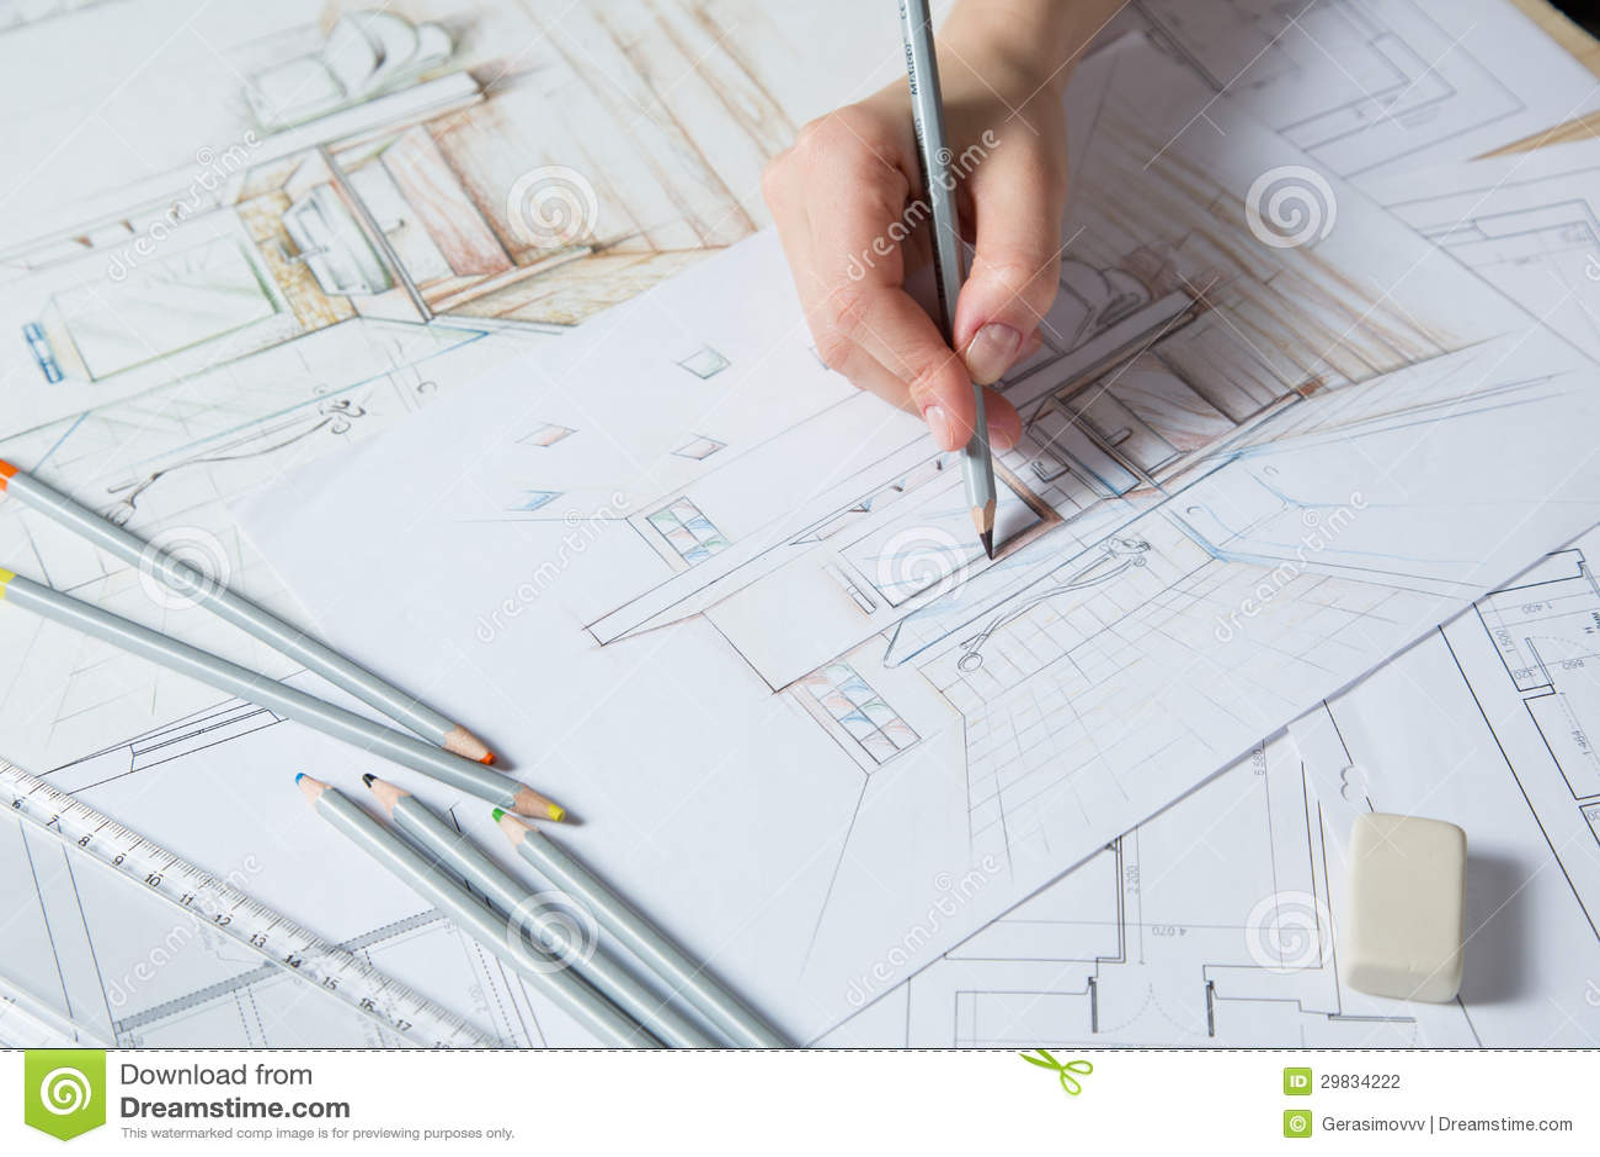 interior designer works on a hand drawing sketch using color pencils